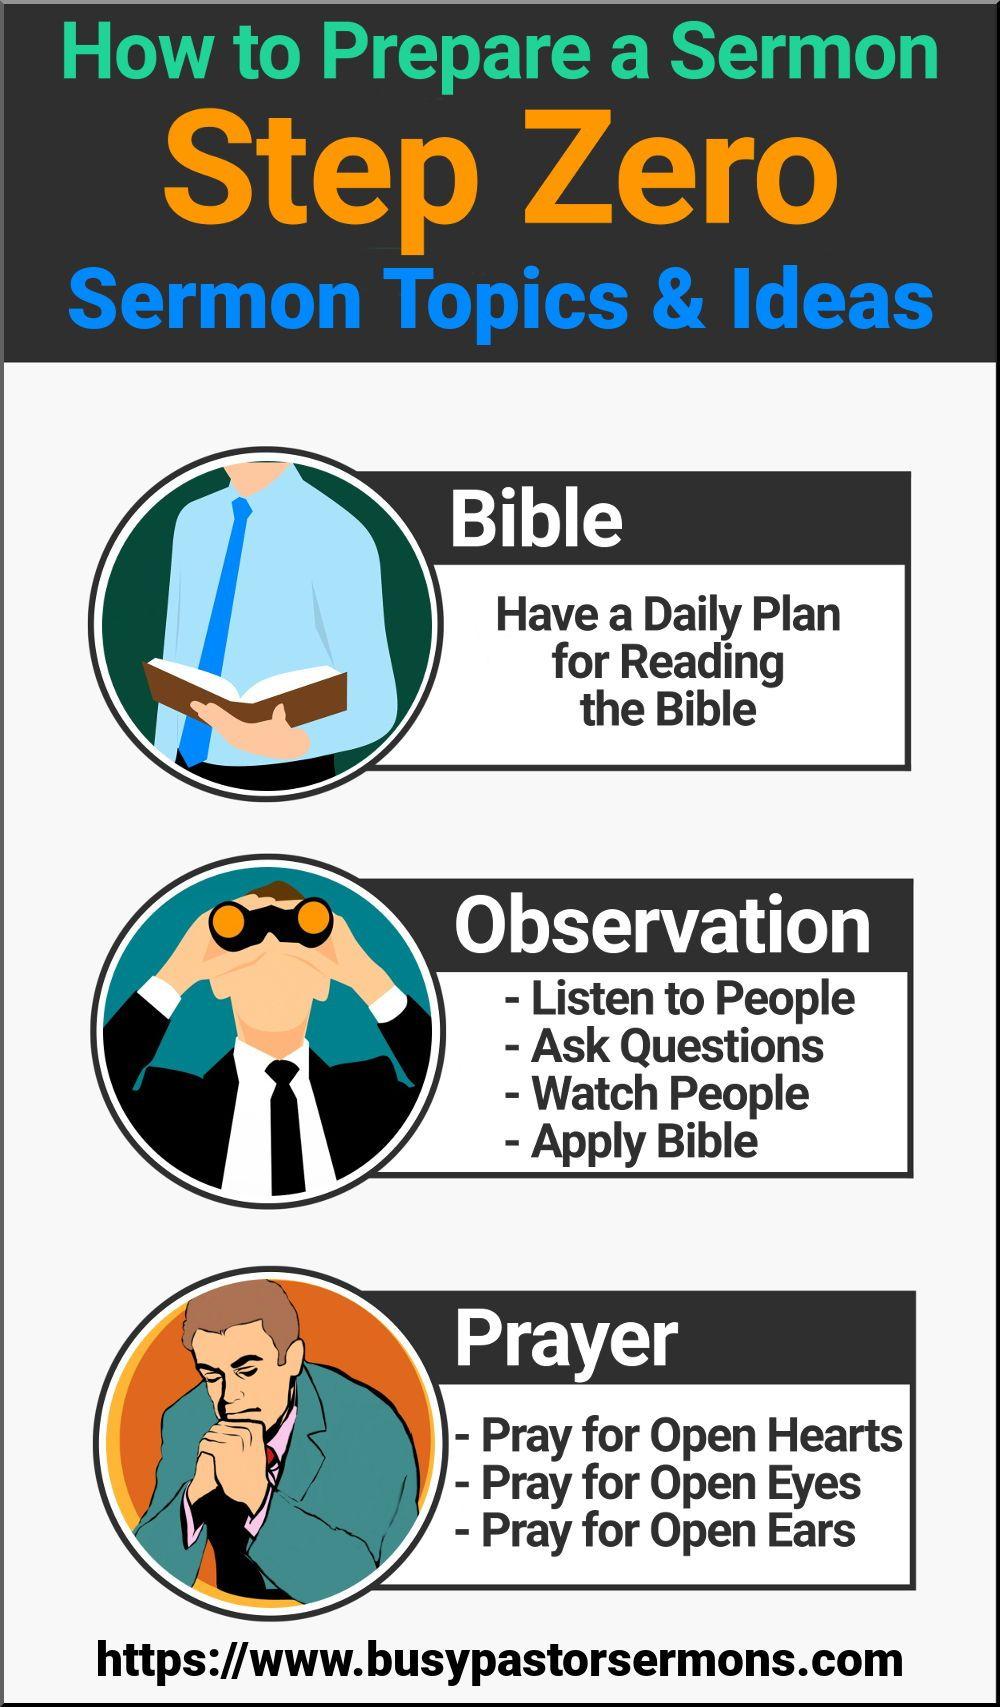 How to Prepare a Sermon Step Zero Bible topics, Bible